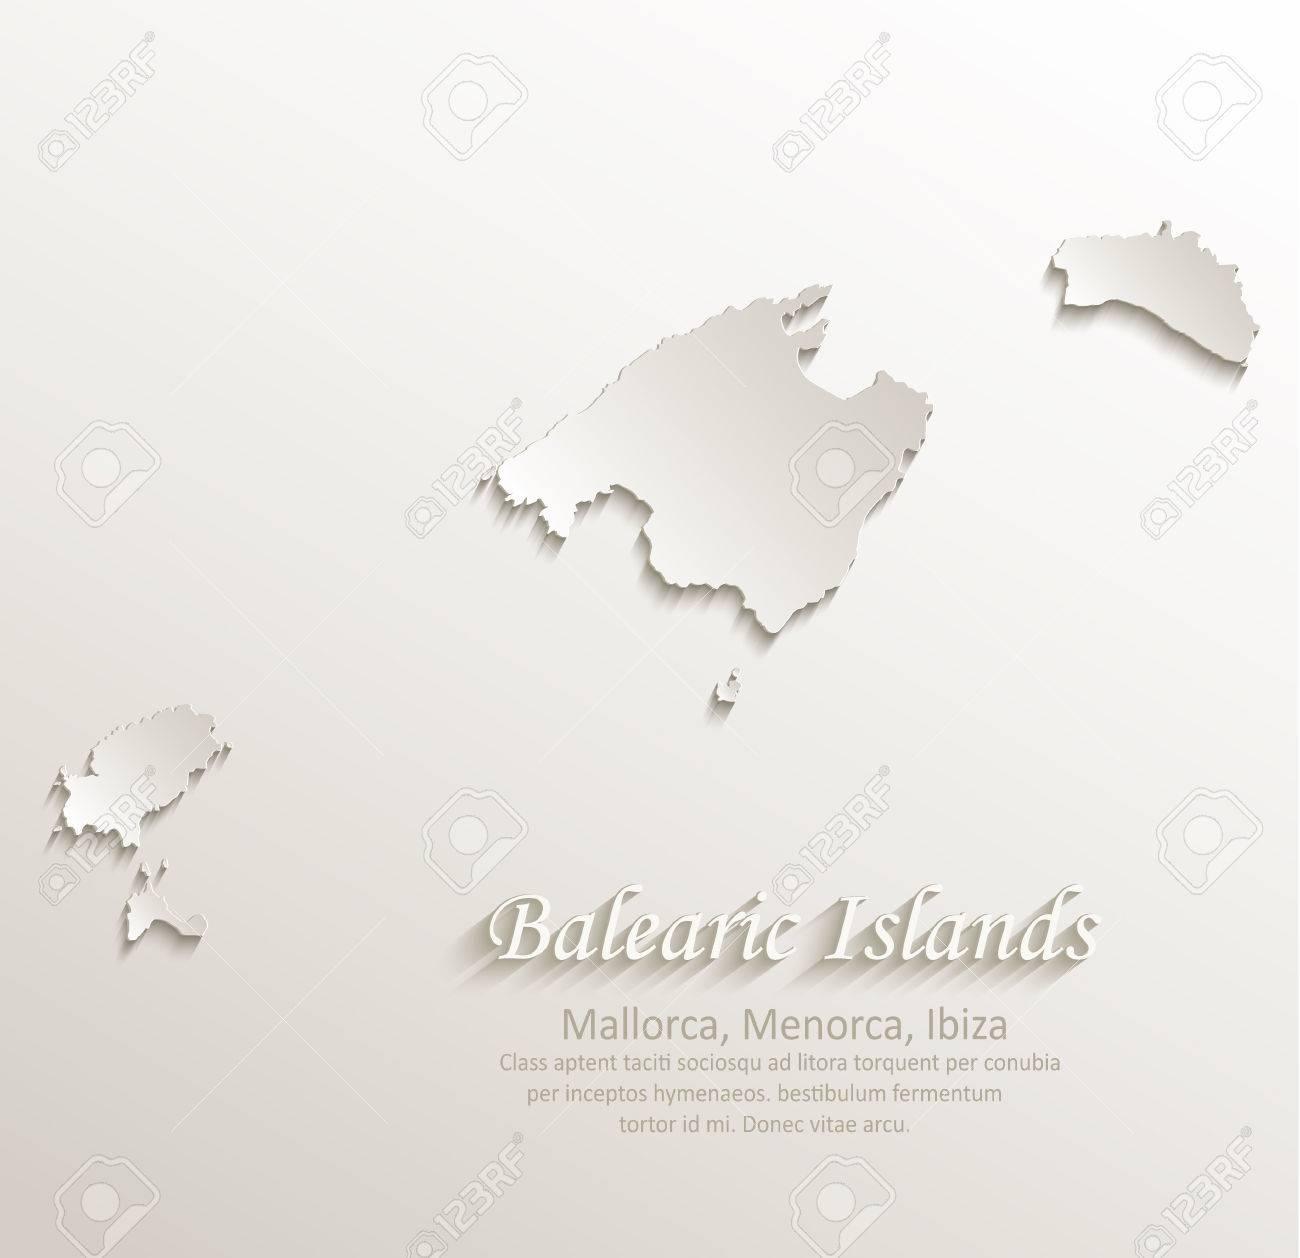 Ibiza Karte Umriss.Balearic Islands Mallorca Menorca Ibiza Map Card Paper 3d